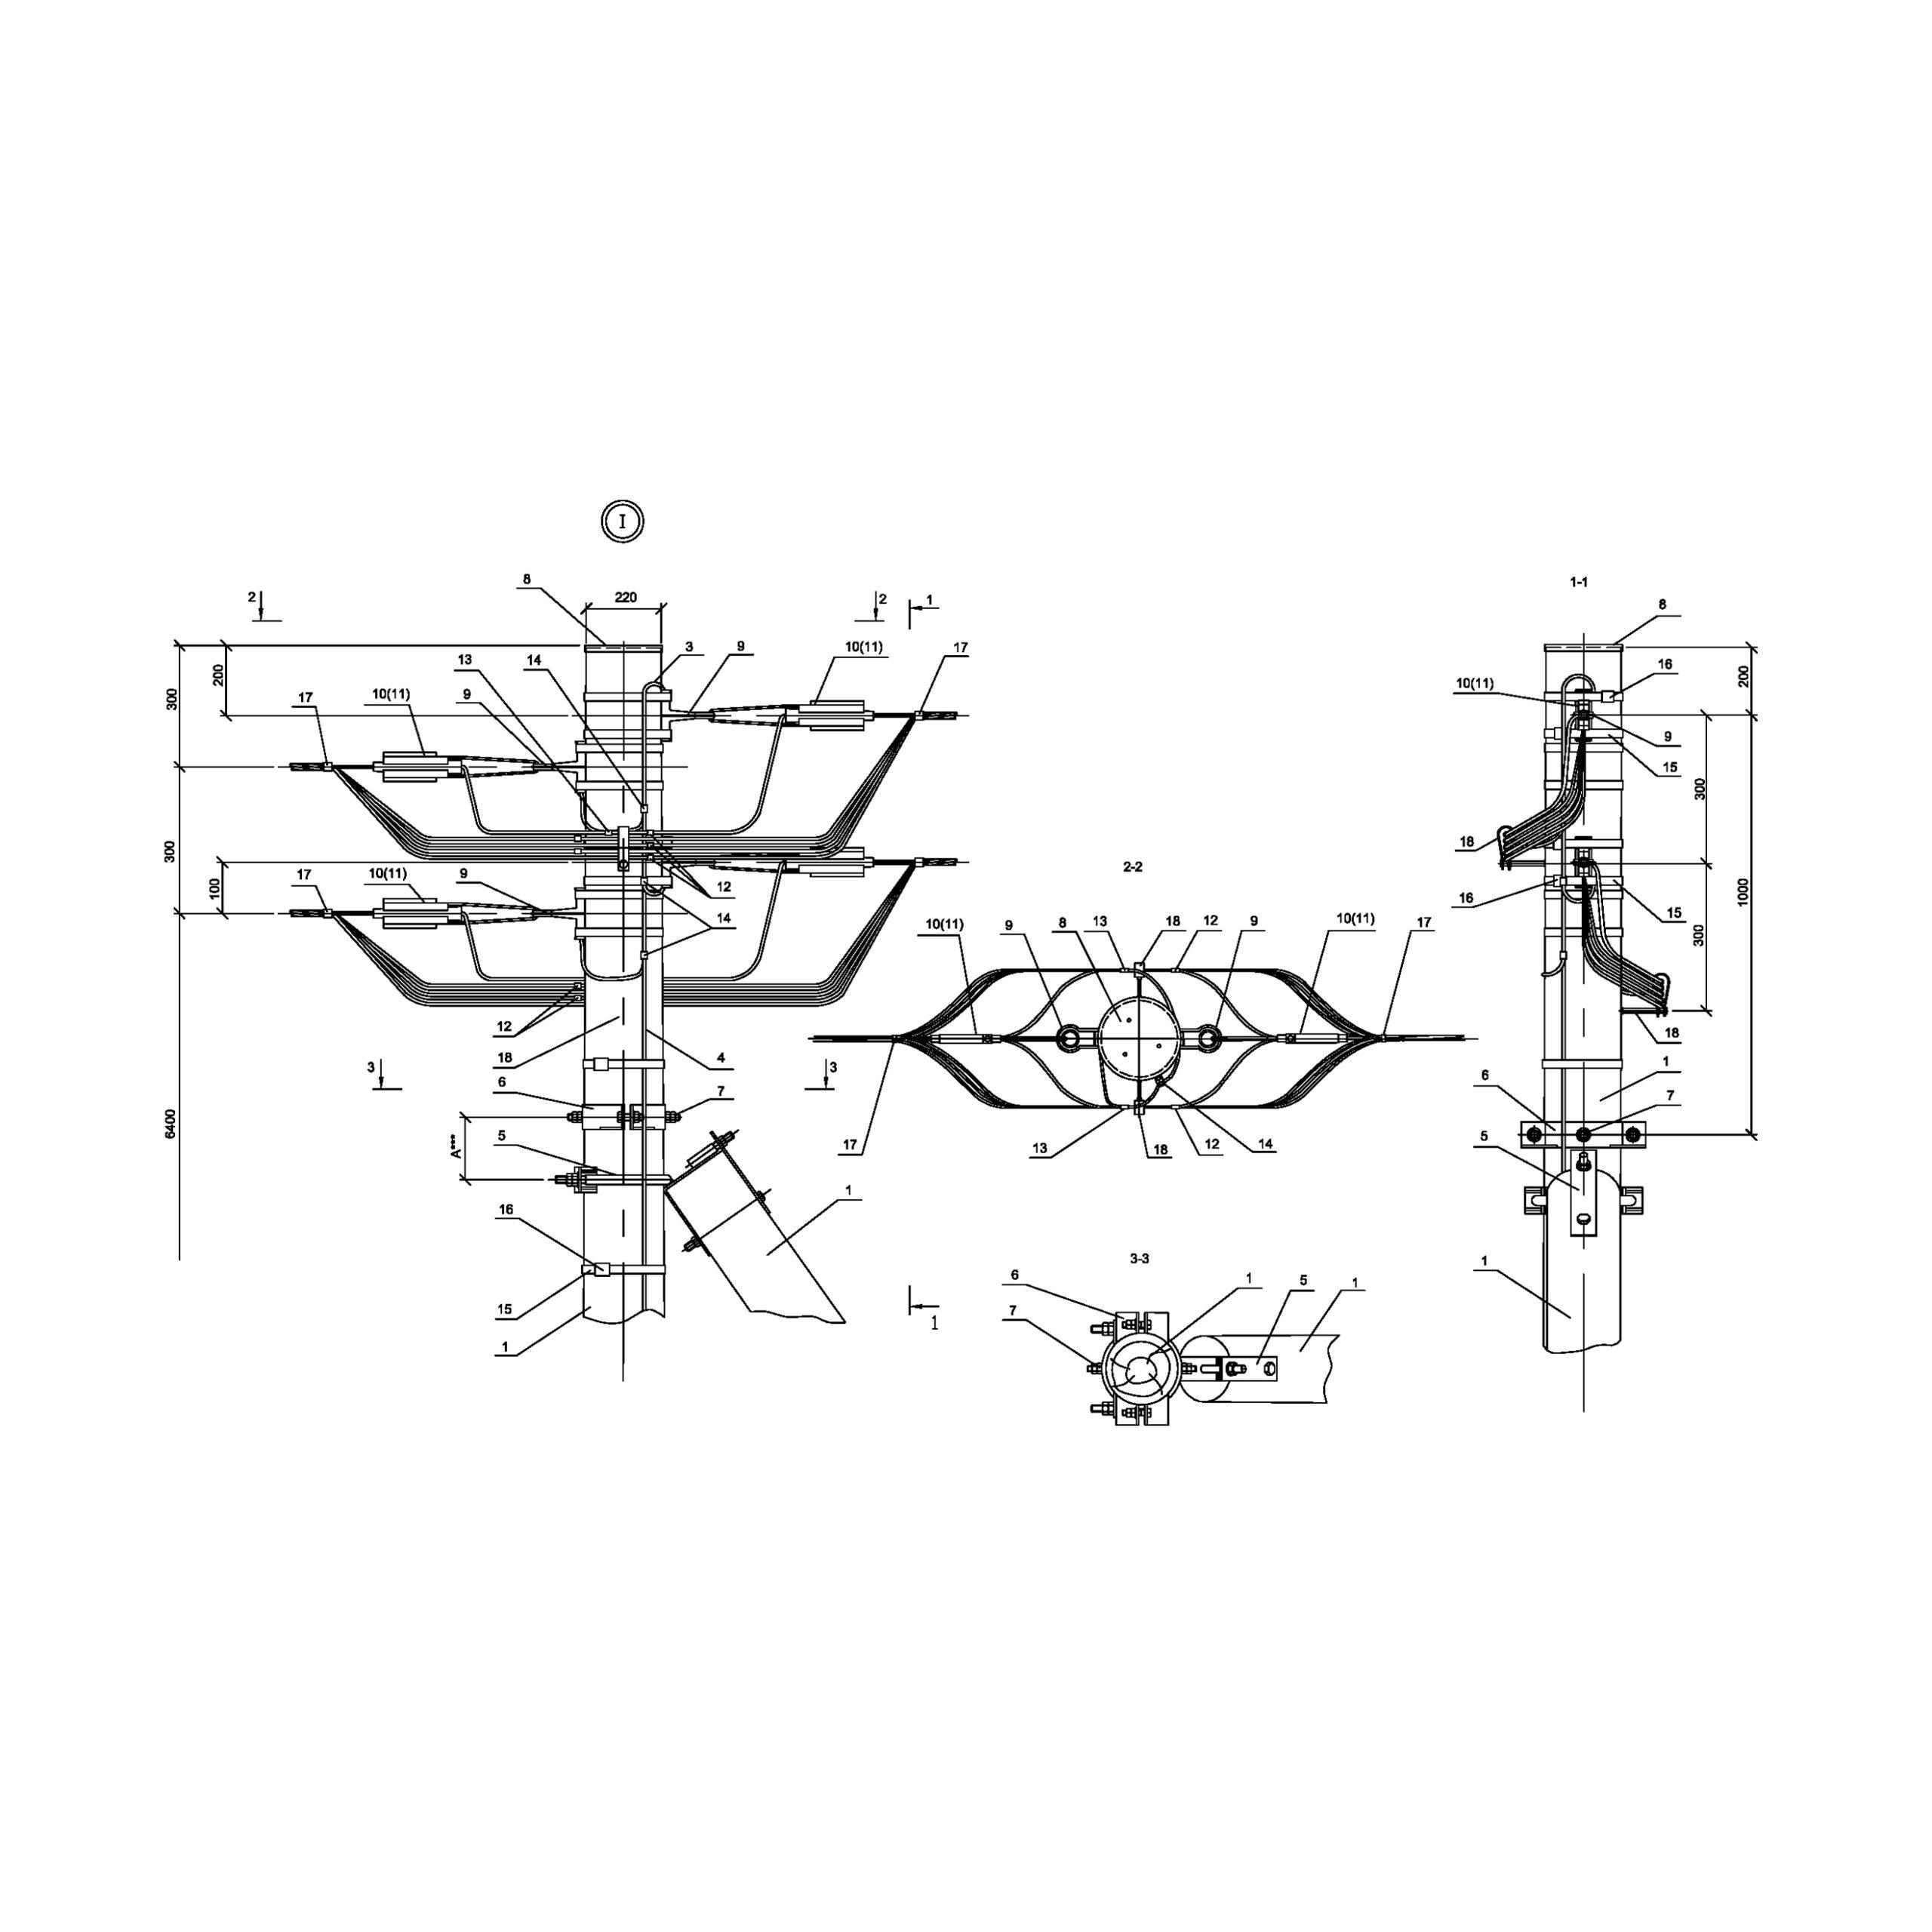 Опора Ад161 деревянная анкерная концевая двухцепная IEK